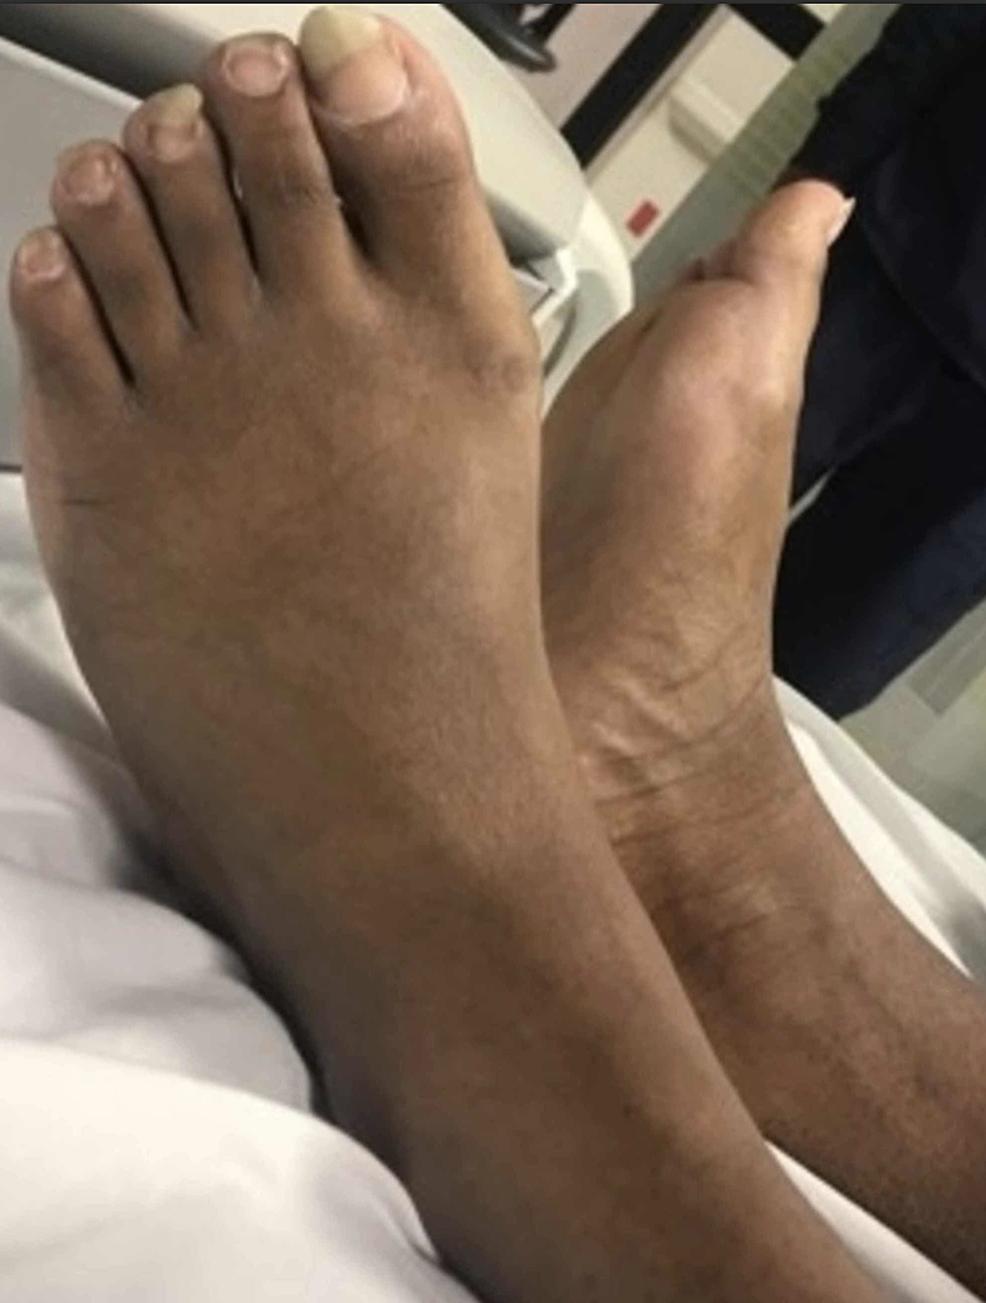 Dorsum-of-the-feet-(anatomically-normal)